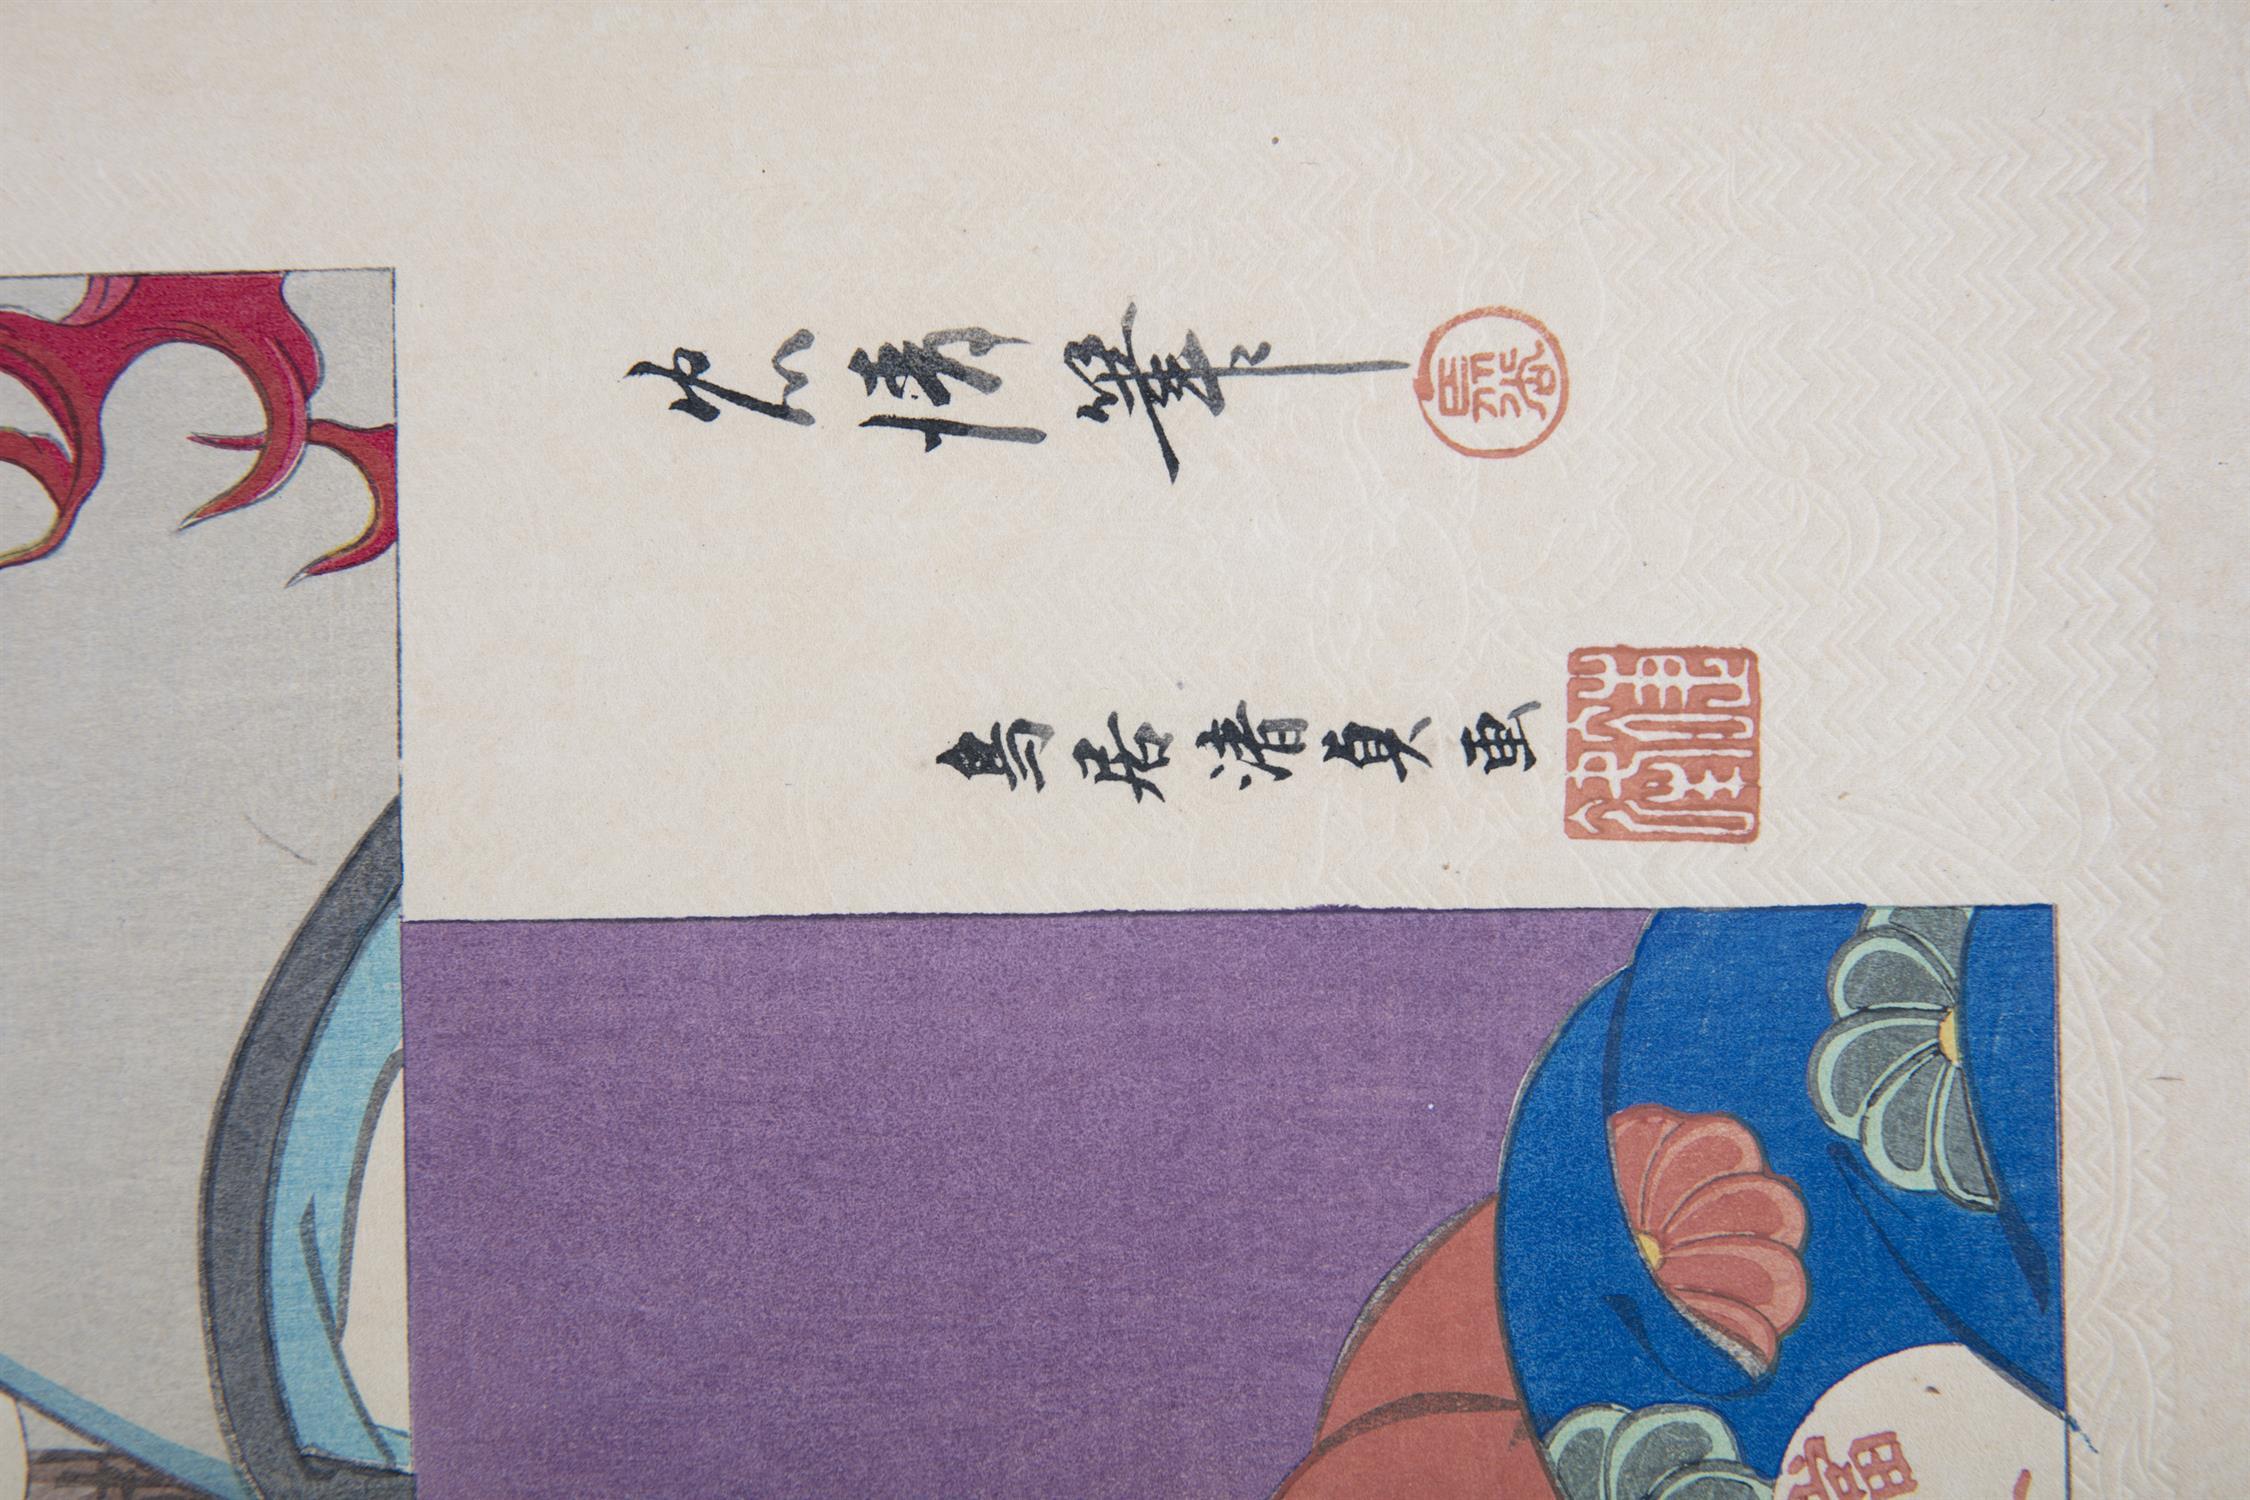 HASEGAWA KANPEI XIV (TADAKIYO) (1847-1929) Actor Ichikawa Danjûrô IX as Narukami Shônin, with an - Image 10 of 12